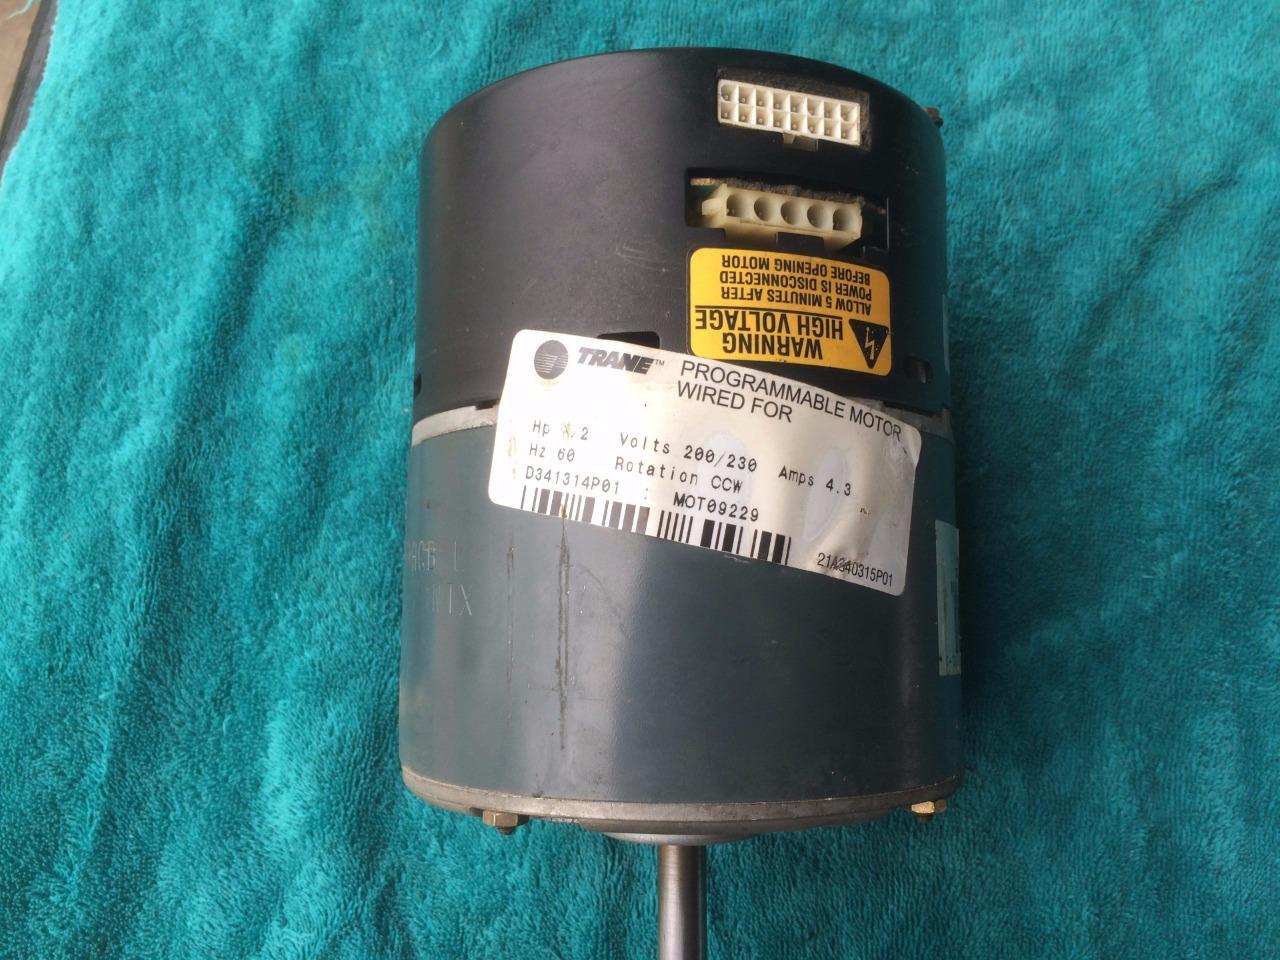 Trane d341314p01 ecm module mot09229 ge ecm variable speed for Trane blower motor module